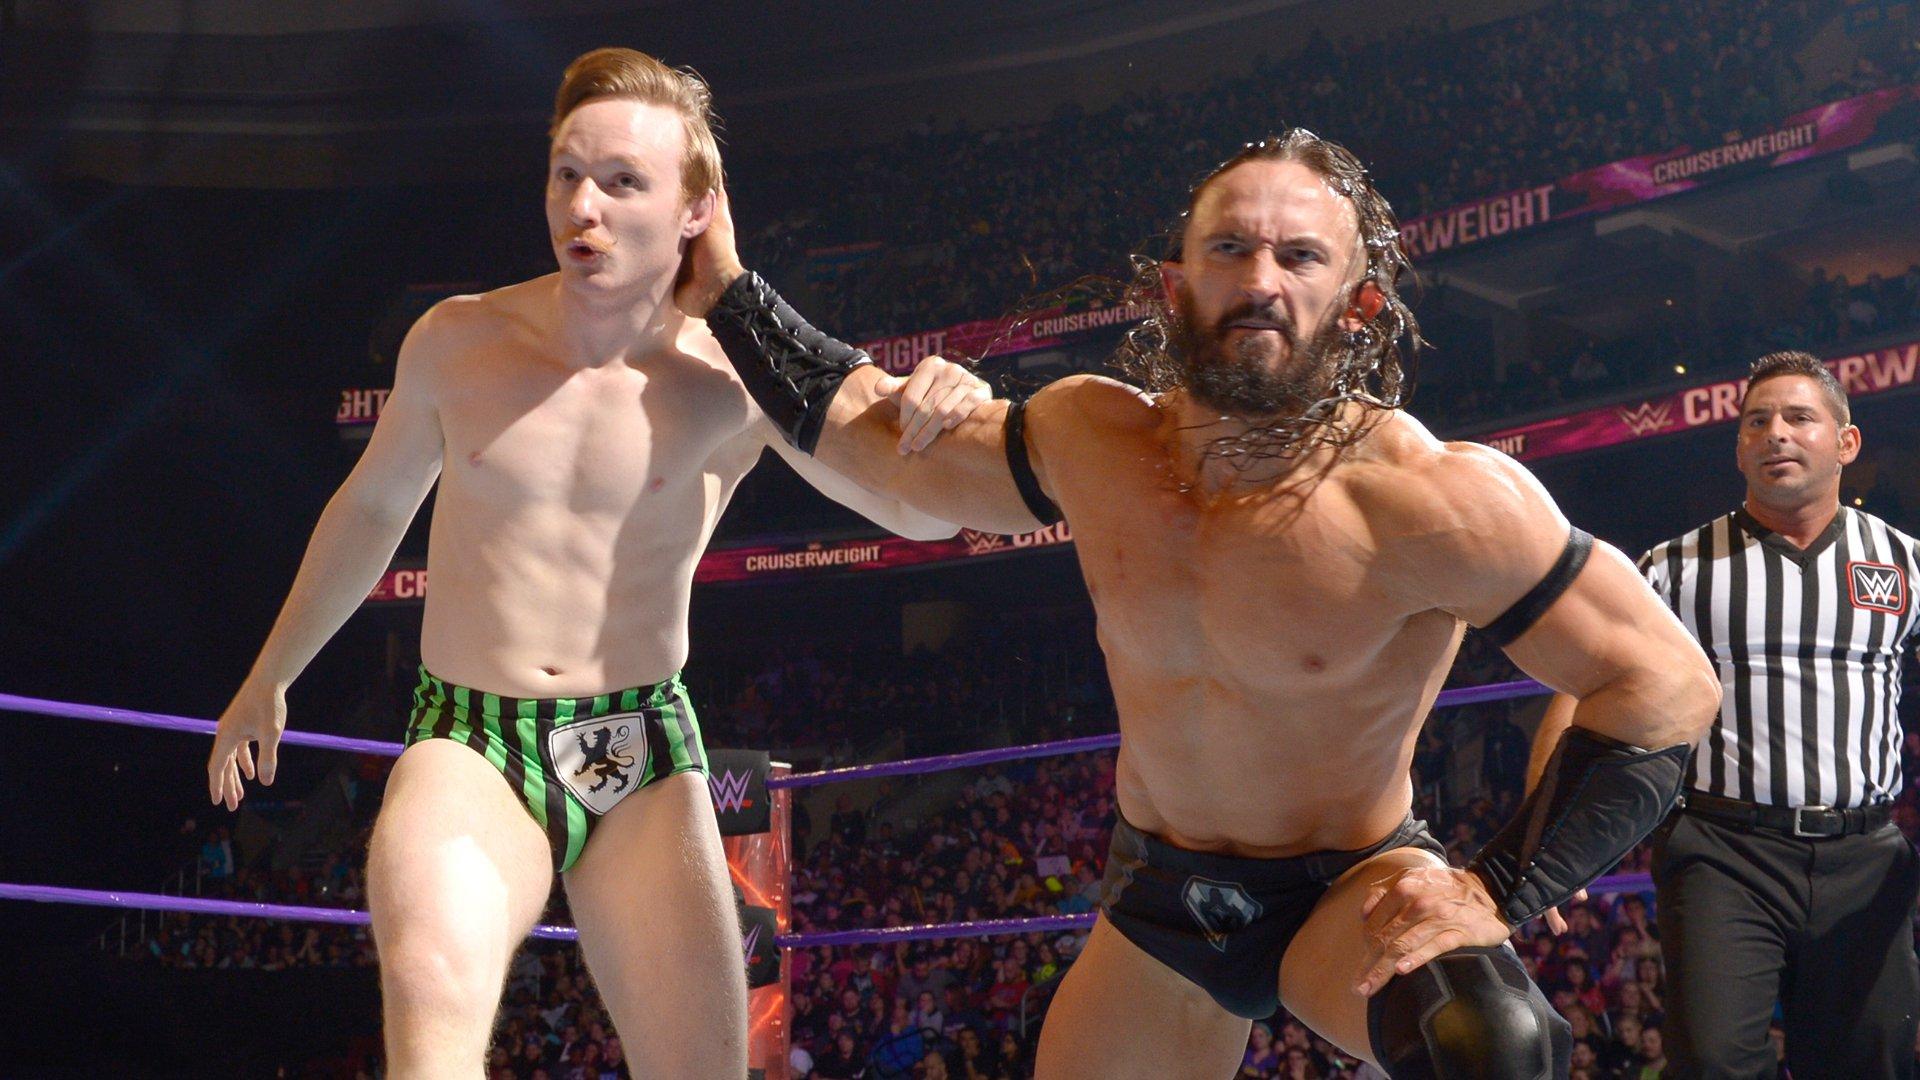 Wrestling Revolution D Exhibition Title Match : Cruiserweight championship match anunciado para o pré show